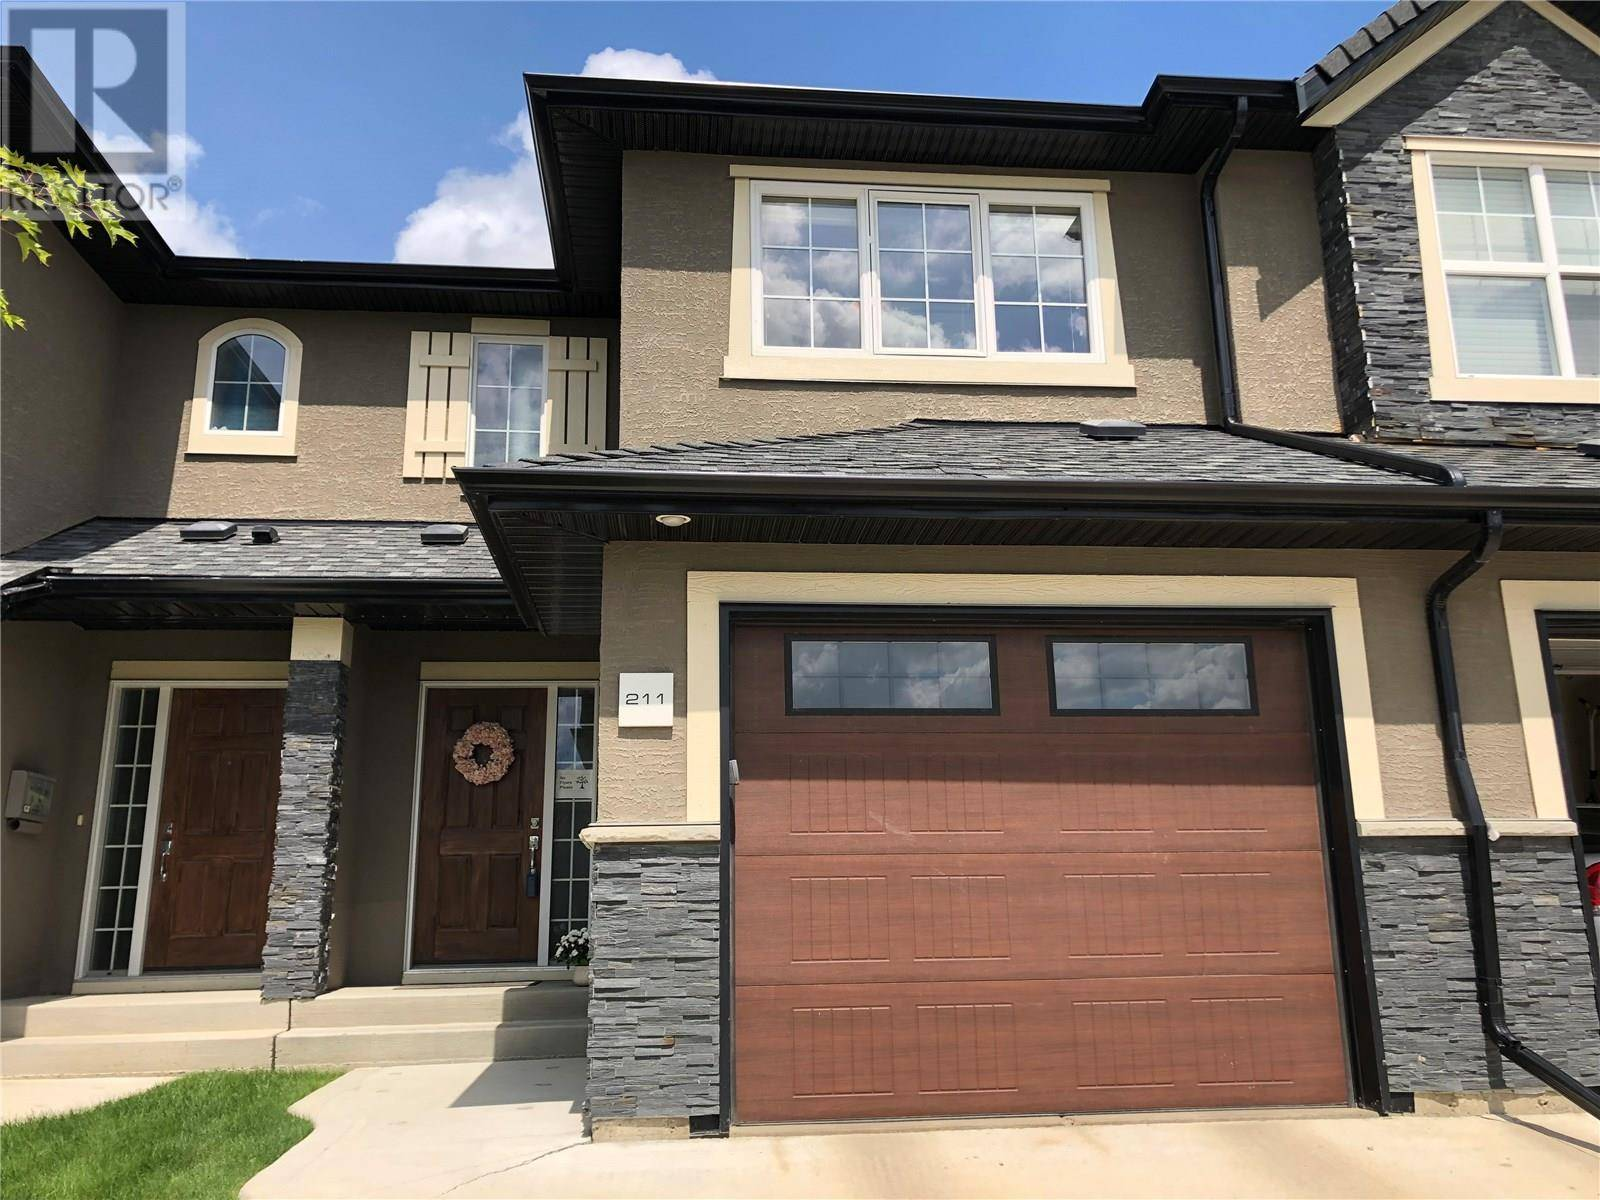 Townhouse for sale at 455 Rempel Ln Unit 211 Saskatoon Saskatchewan - MLS: SK778413